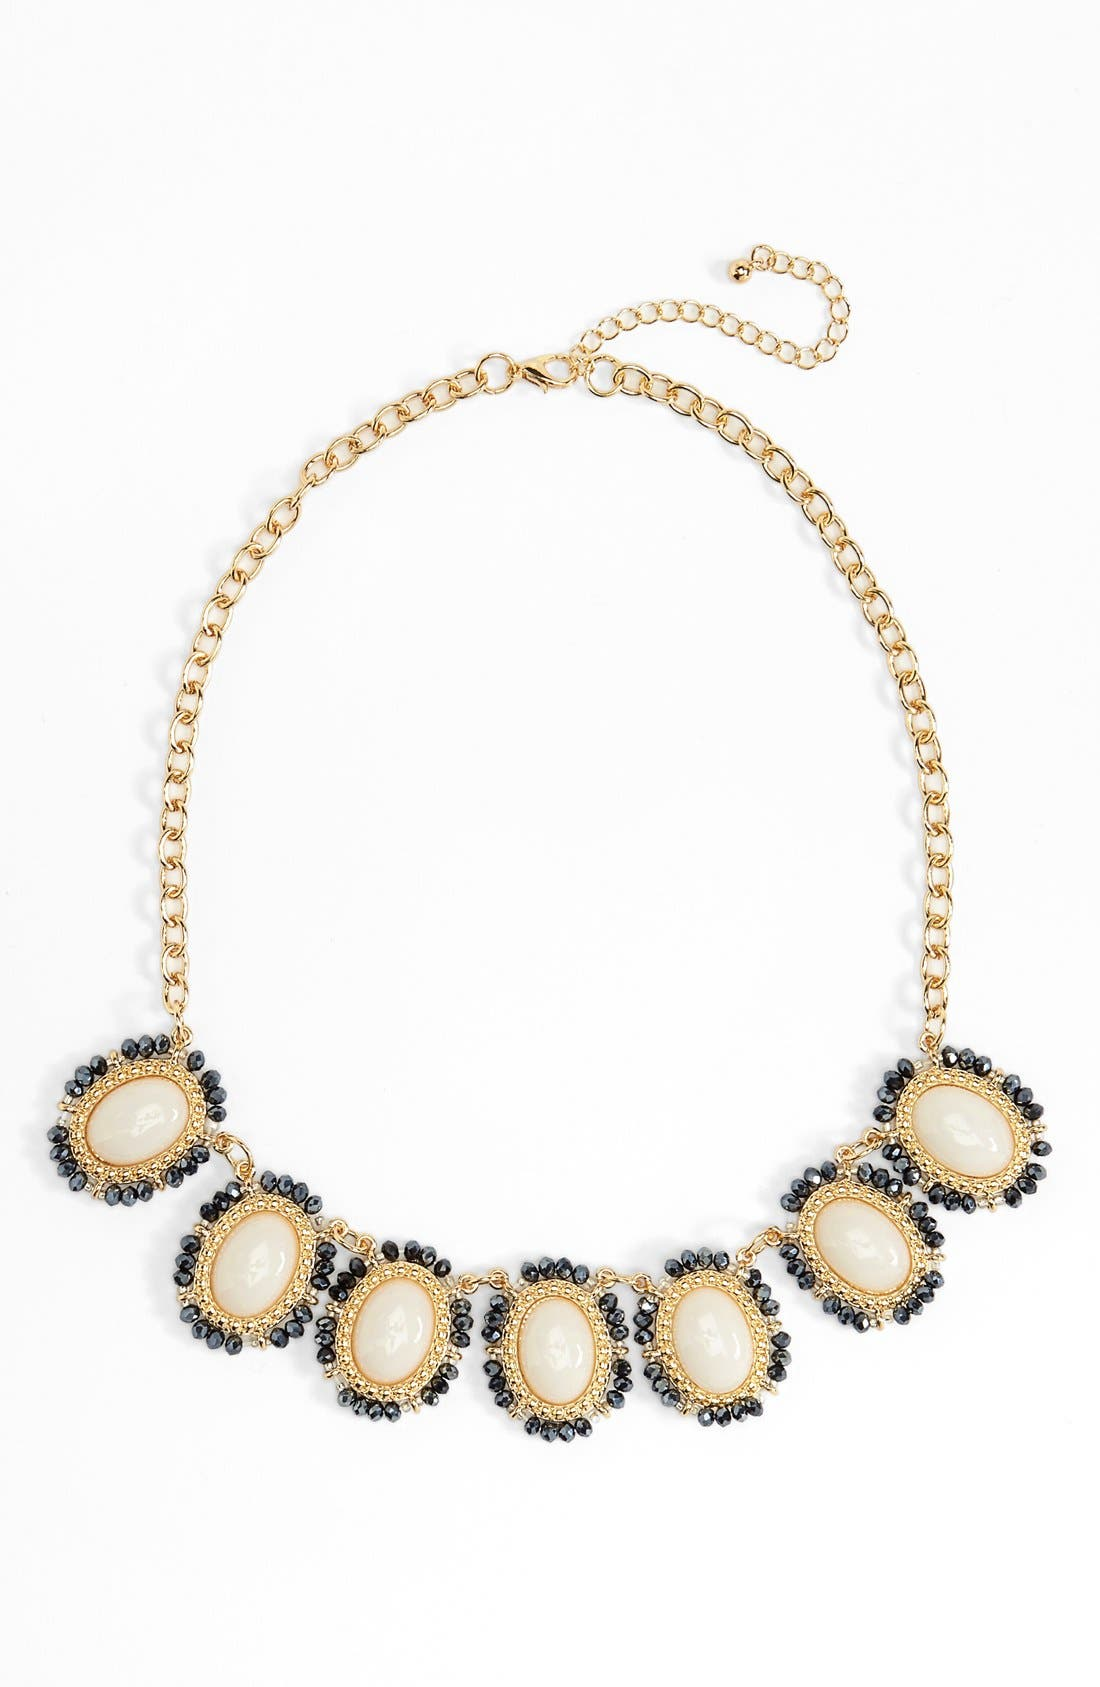 Main Image - BP. Bead & Stone Statement Necklace